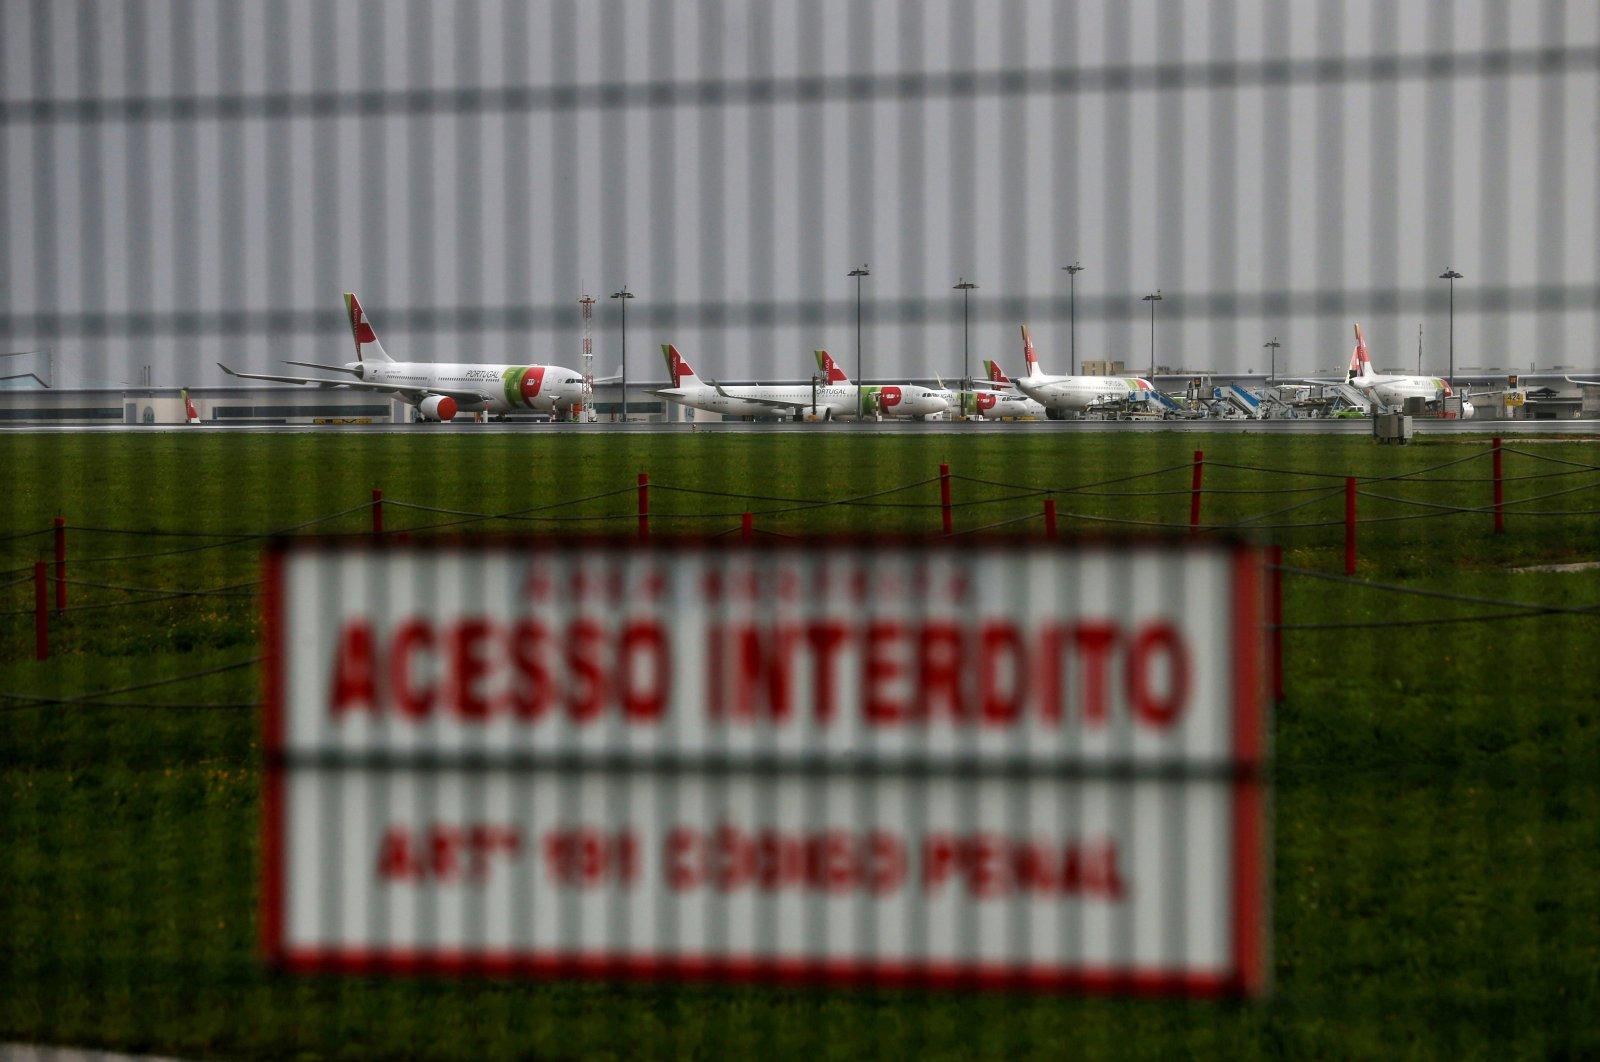 Planes are seen at the Humberto Delgado Airport in Lisbon, Portugal, Dec. 11, 2020. (Reuters Photo)